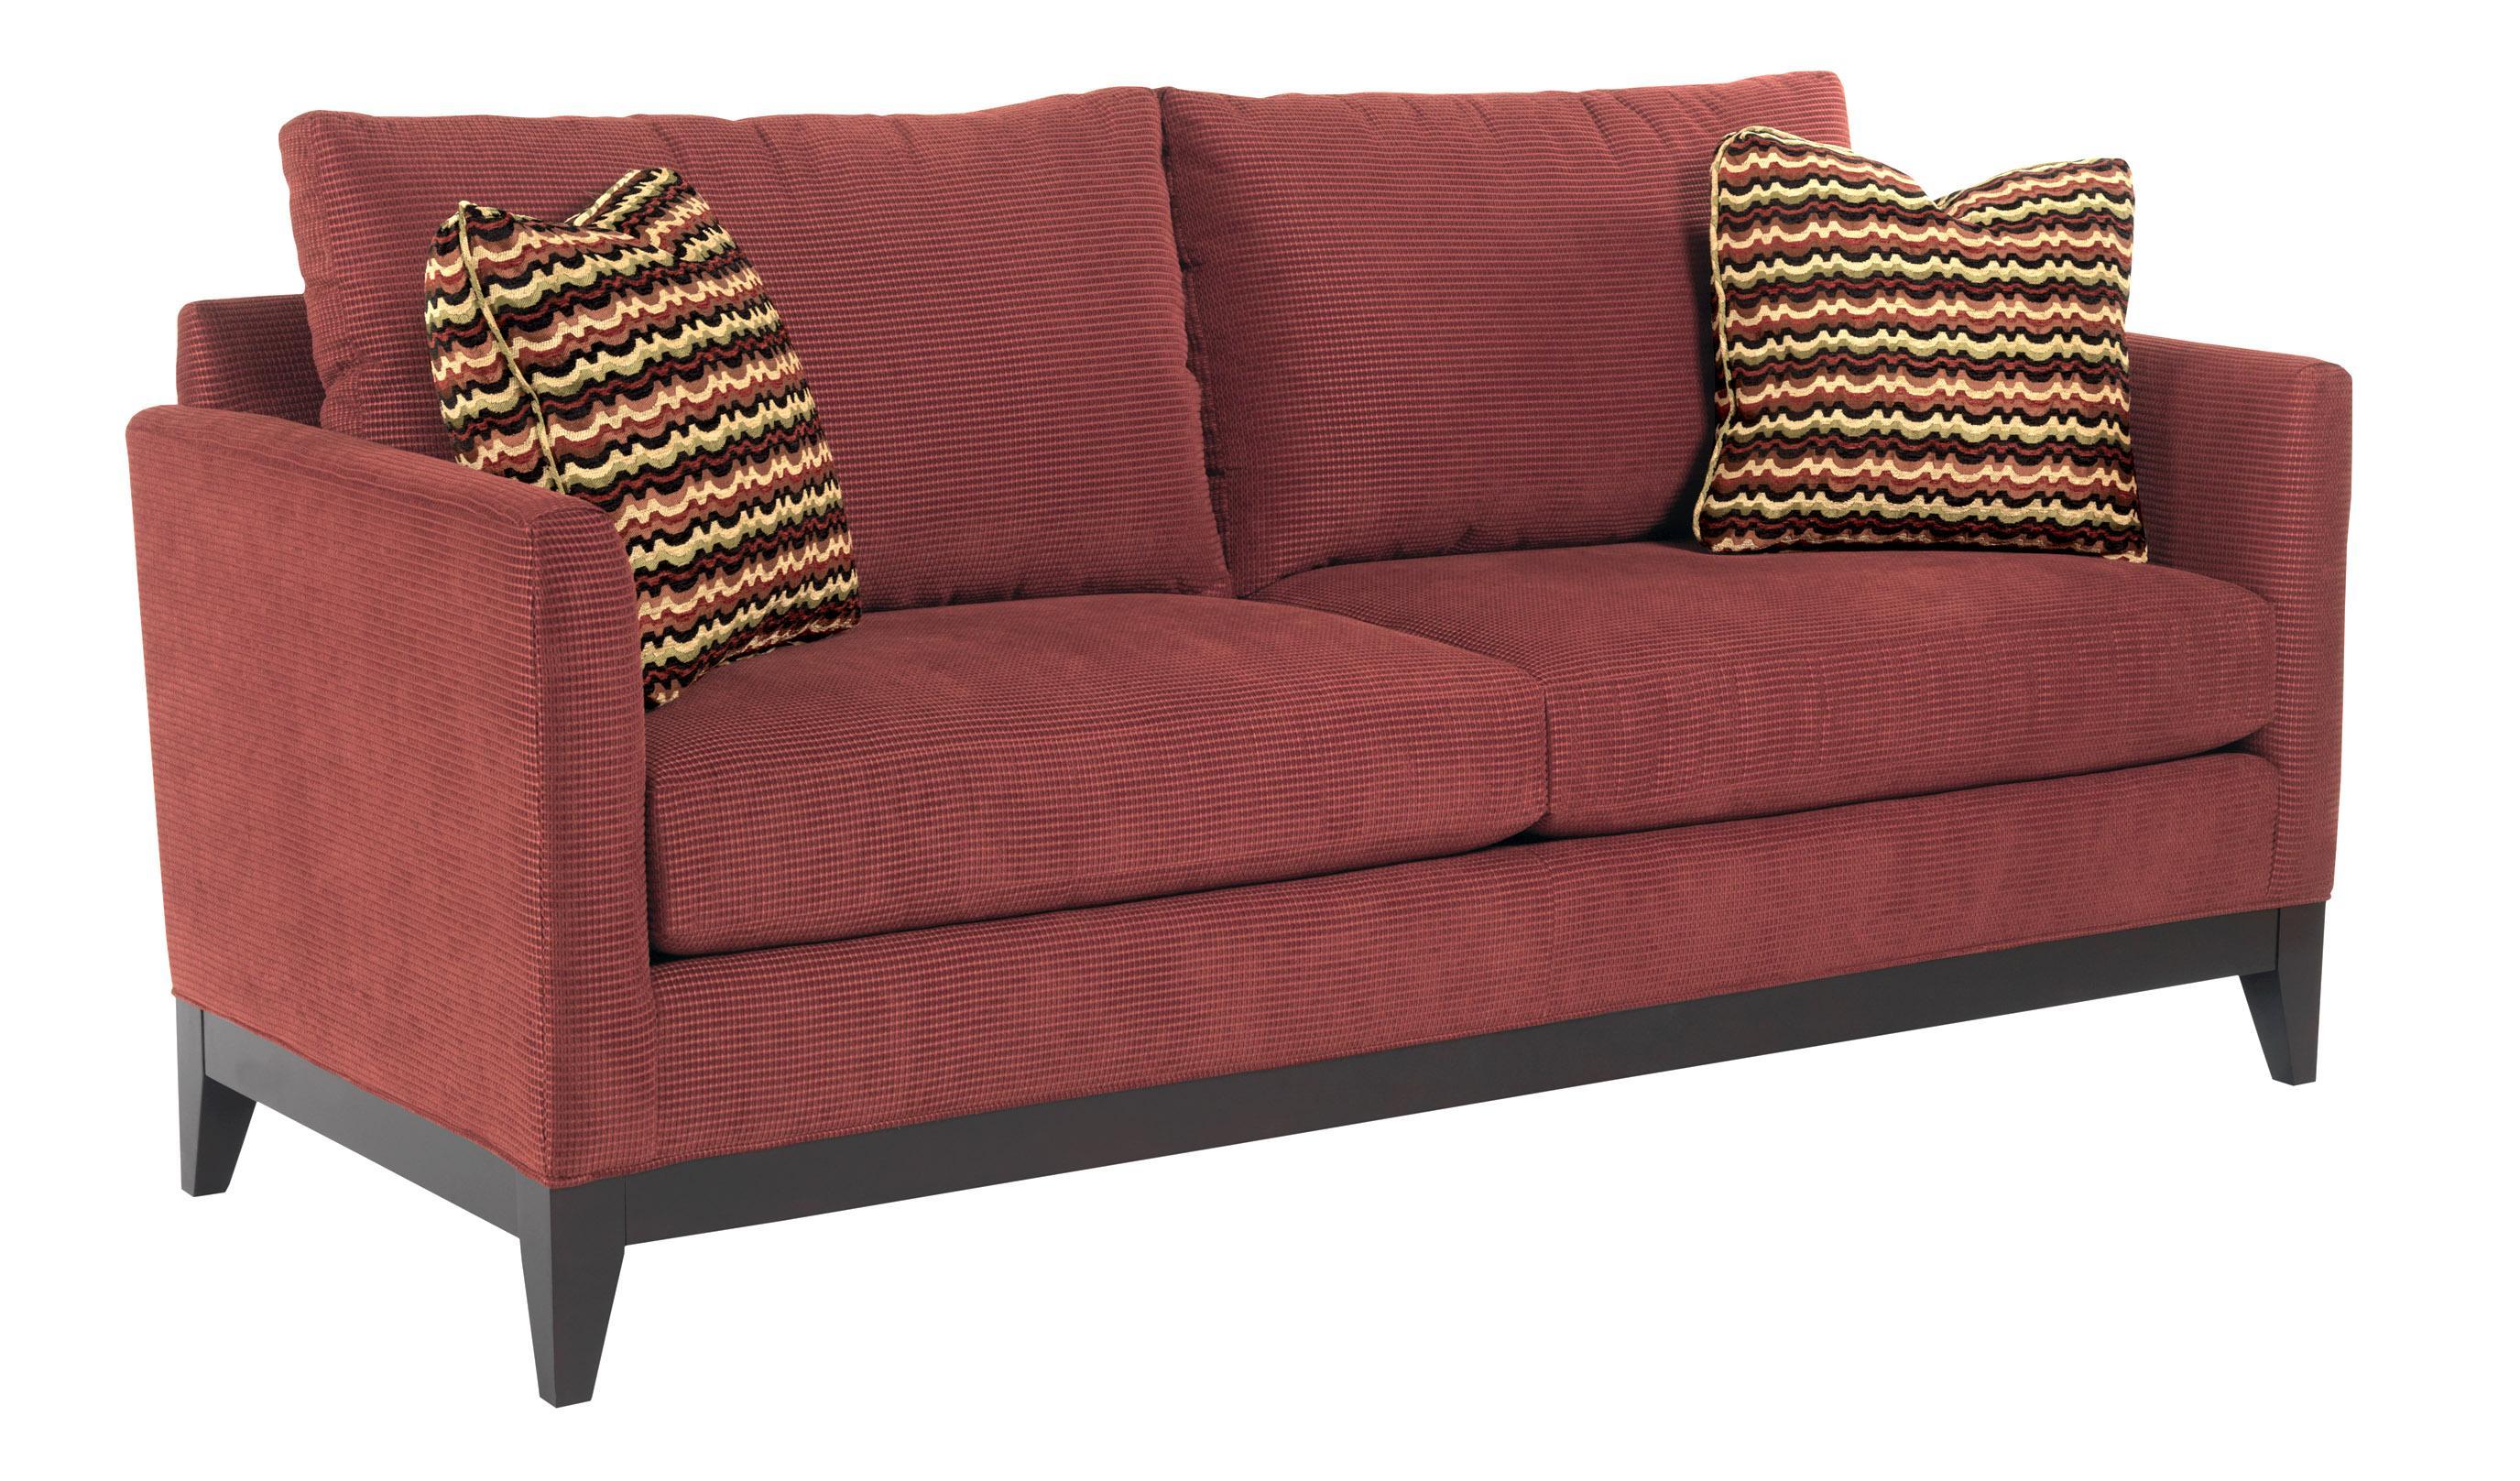 Brooklyn Sofa by Kincaid Furniture at Johnny Janosik